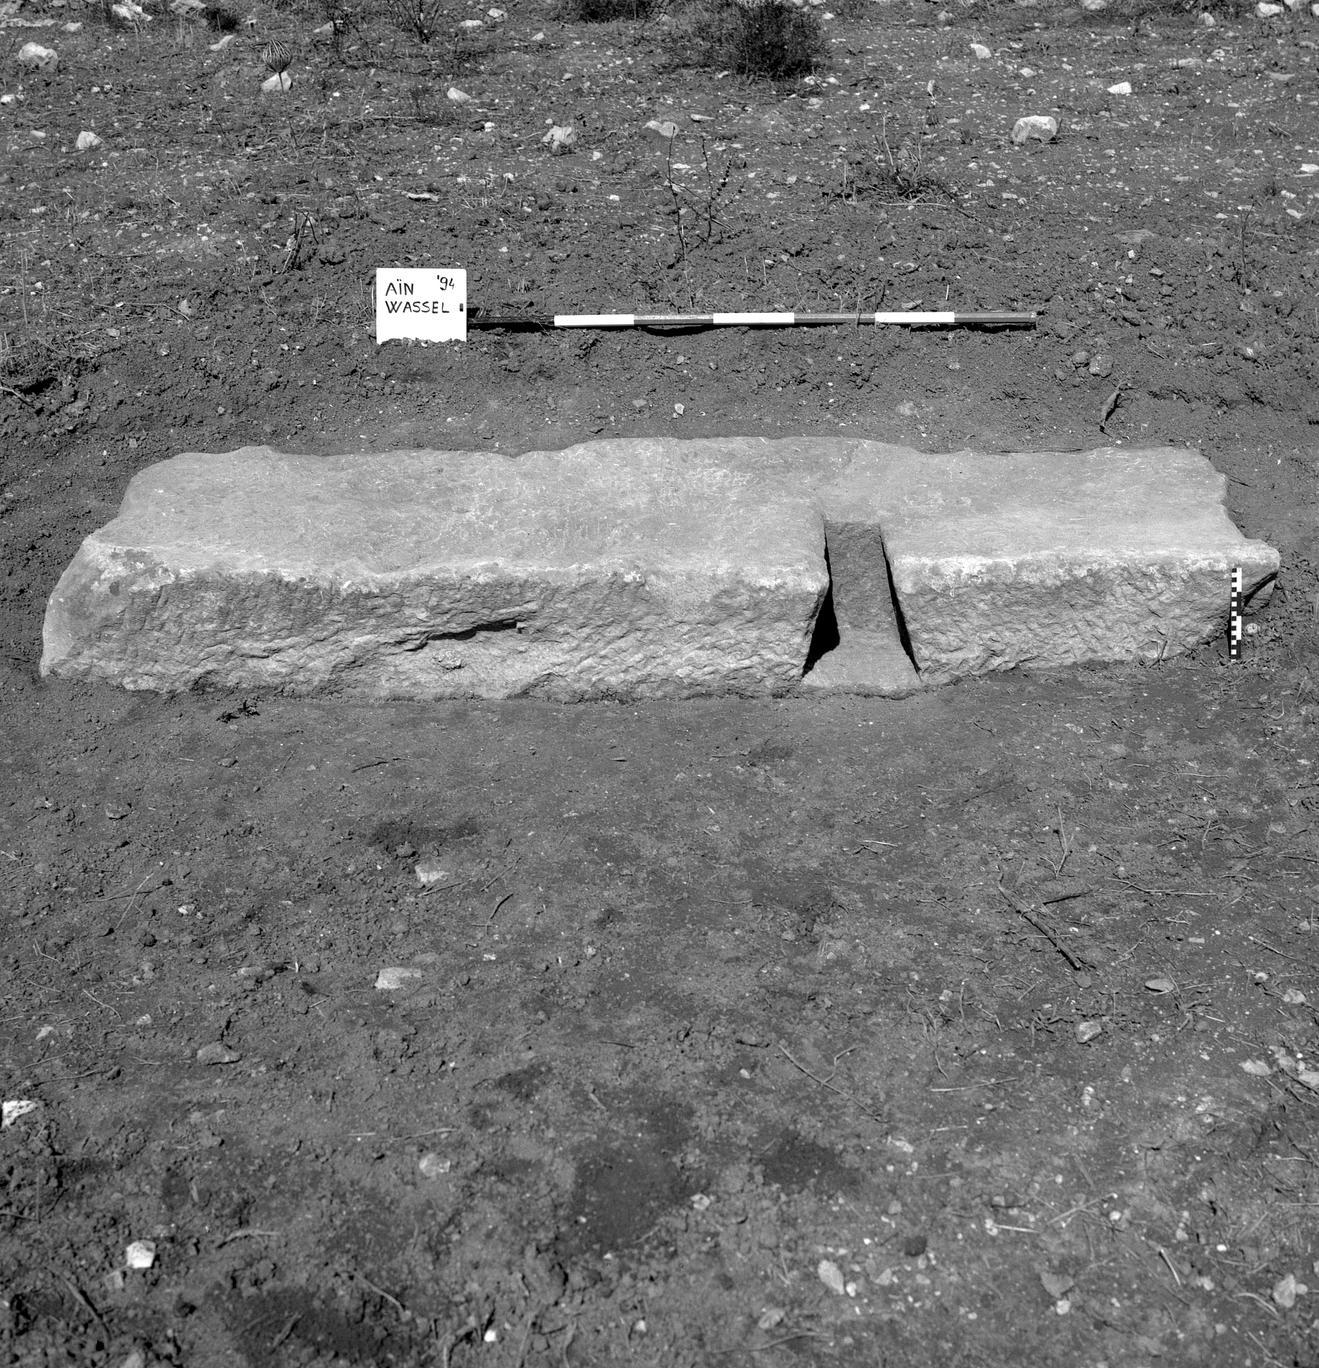 A find: DU025TO003